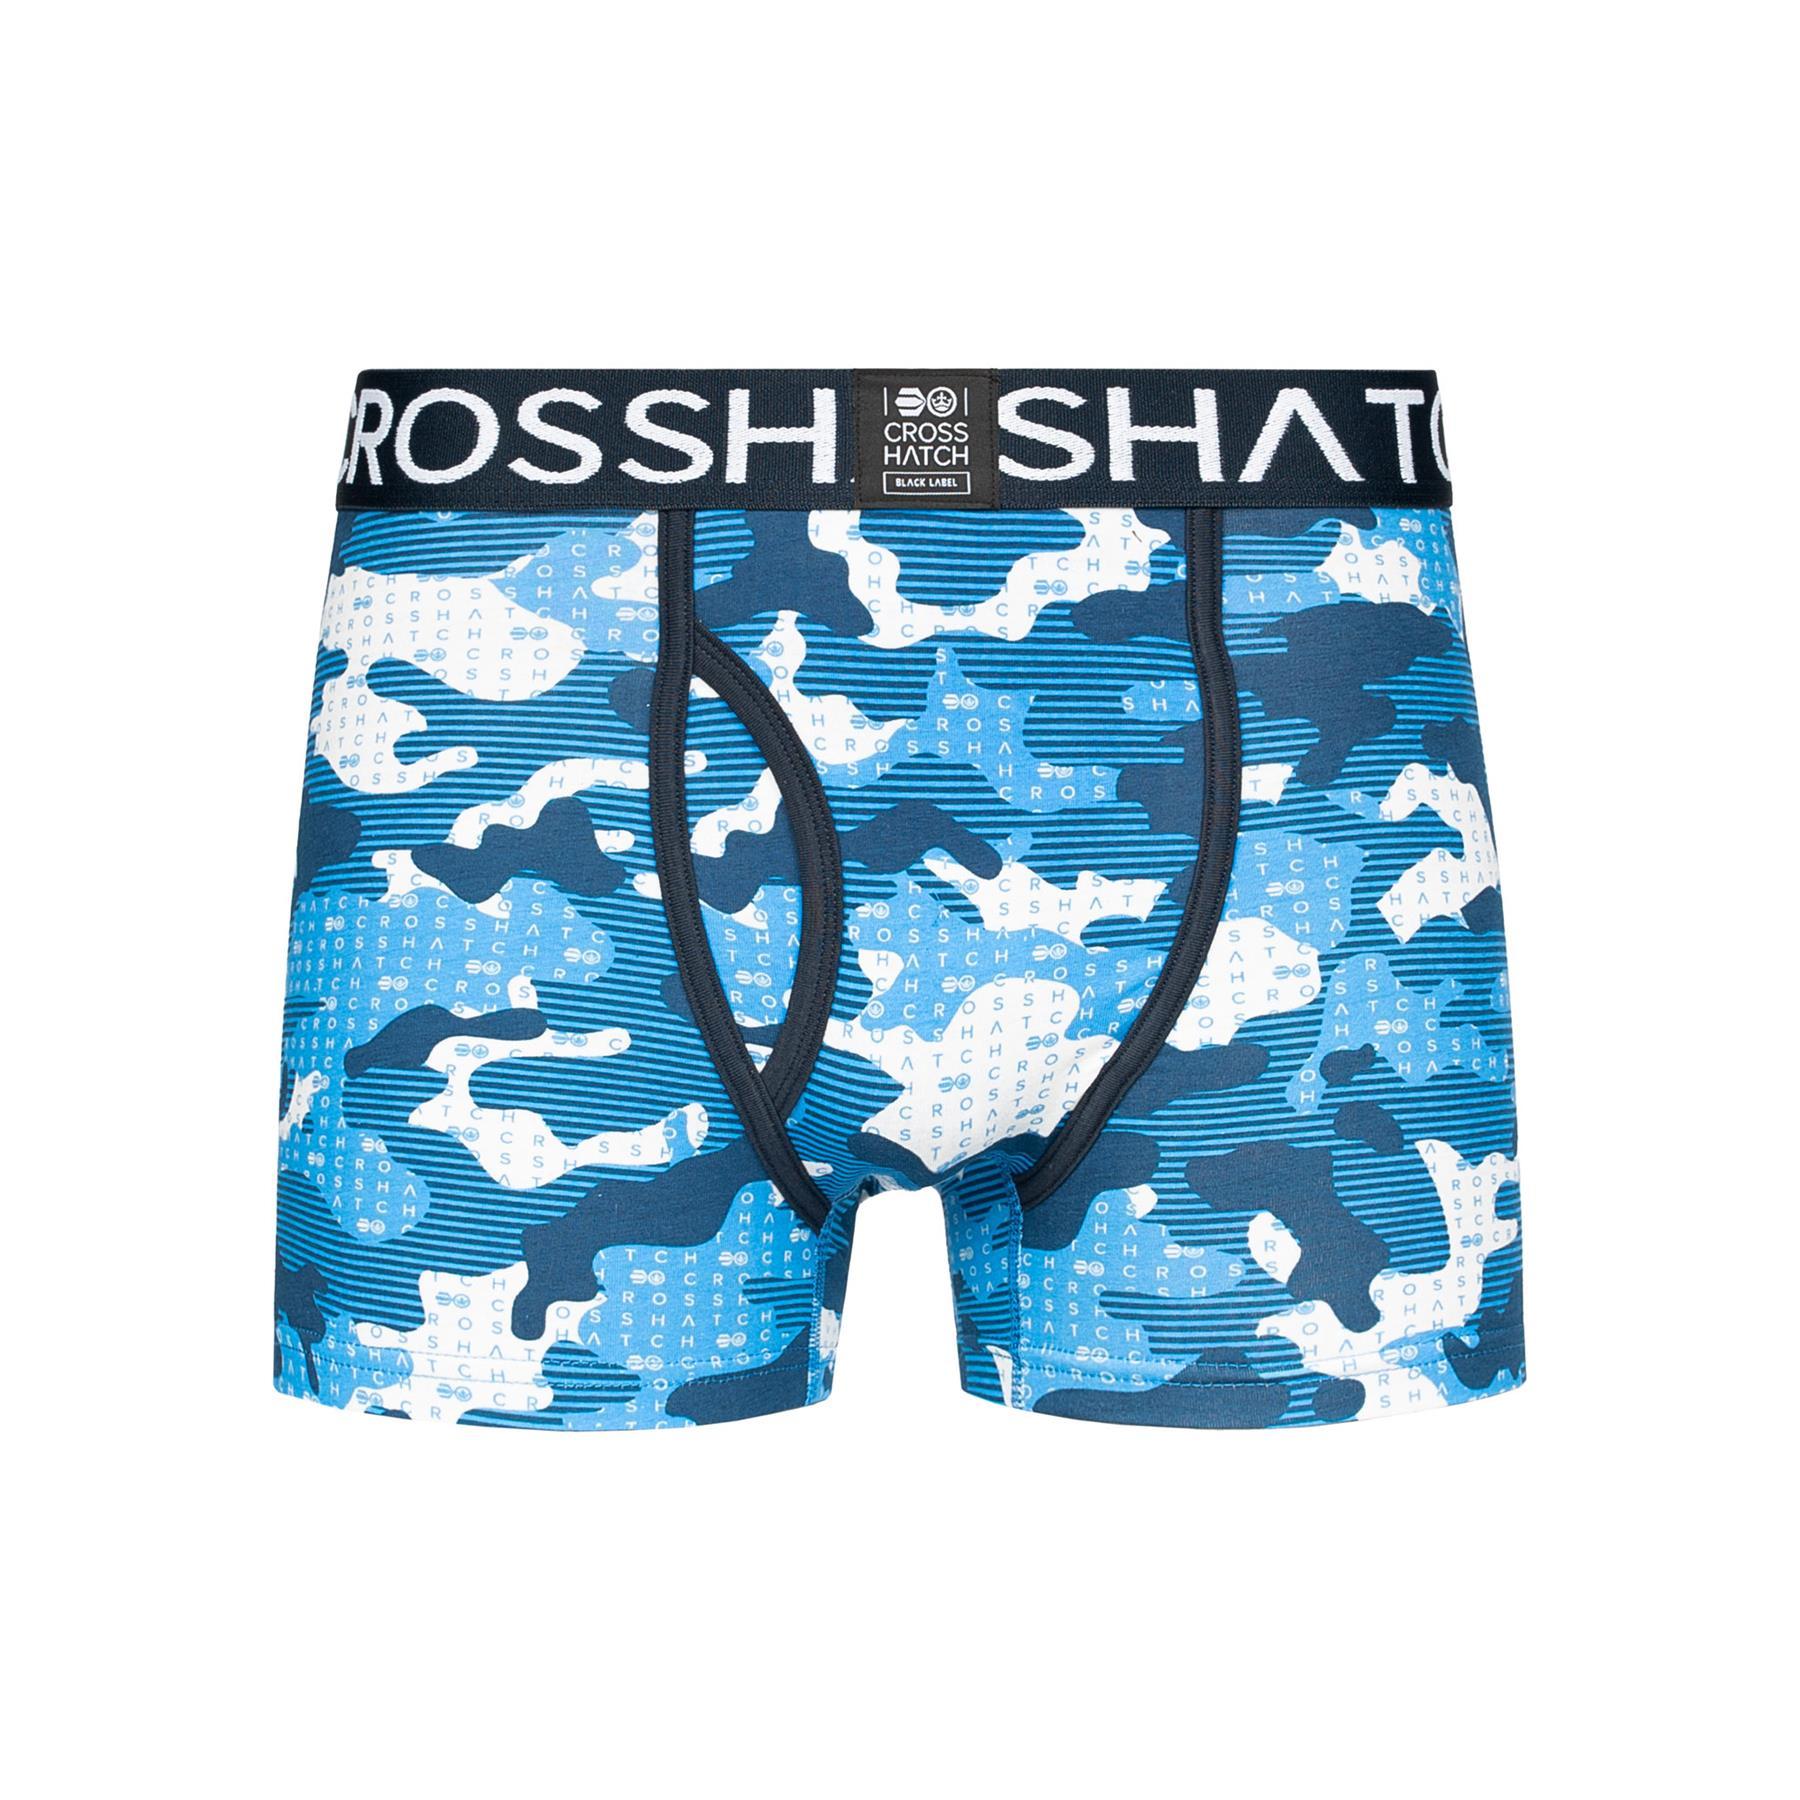 thumbnail 23 - Mens Crosshatch Boxers 3 Pack Shorts Underwear Trunks Underpants Multipack Sets